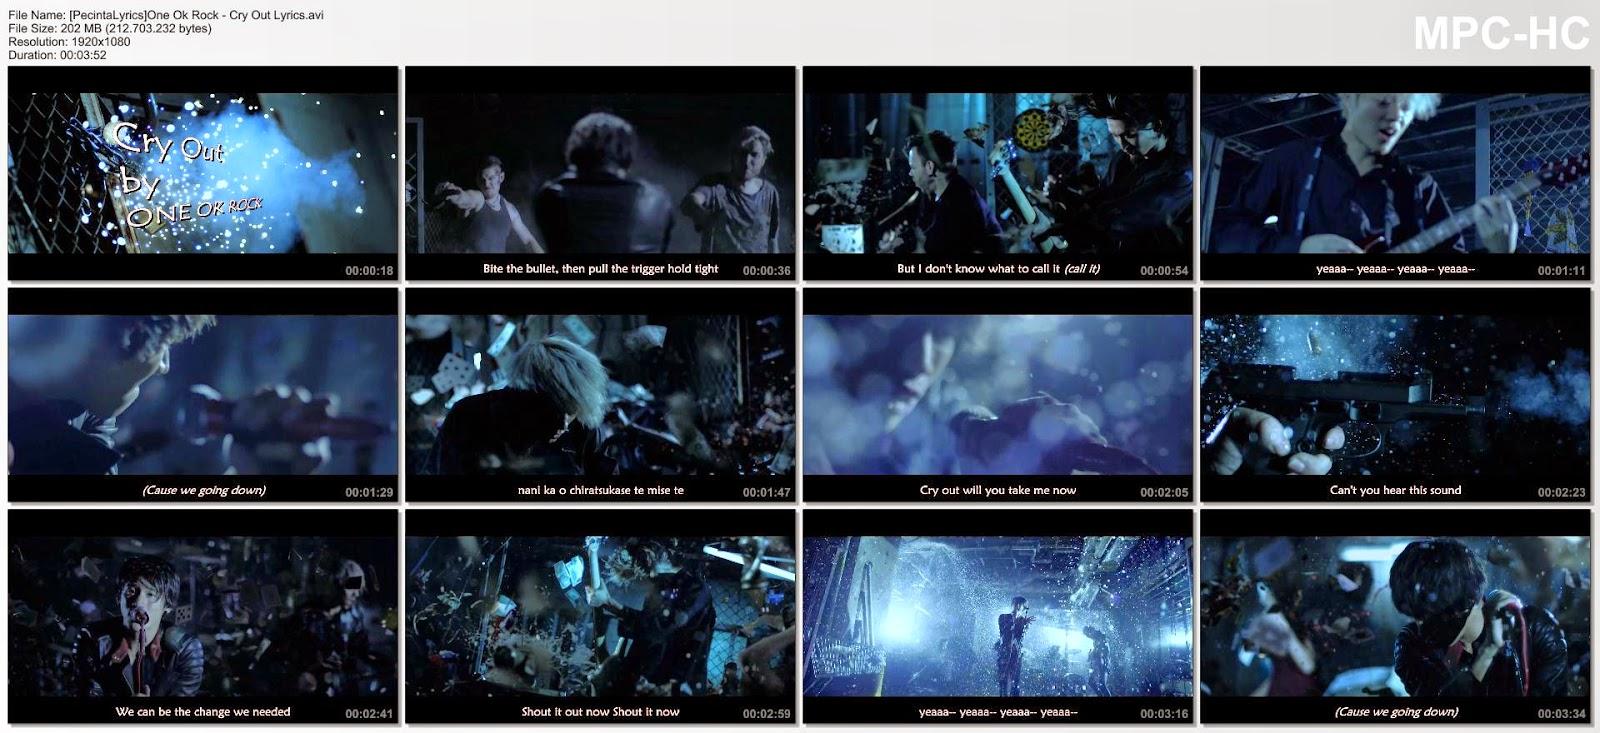 PECINTA LIRIK MUSIK: One Ok Rock - Cry Out with lyrics